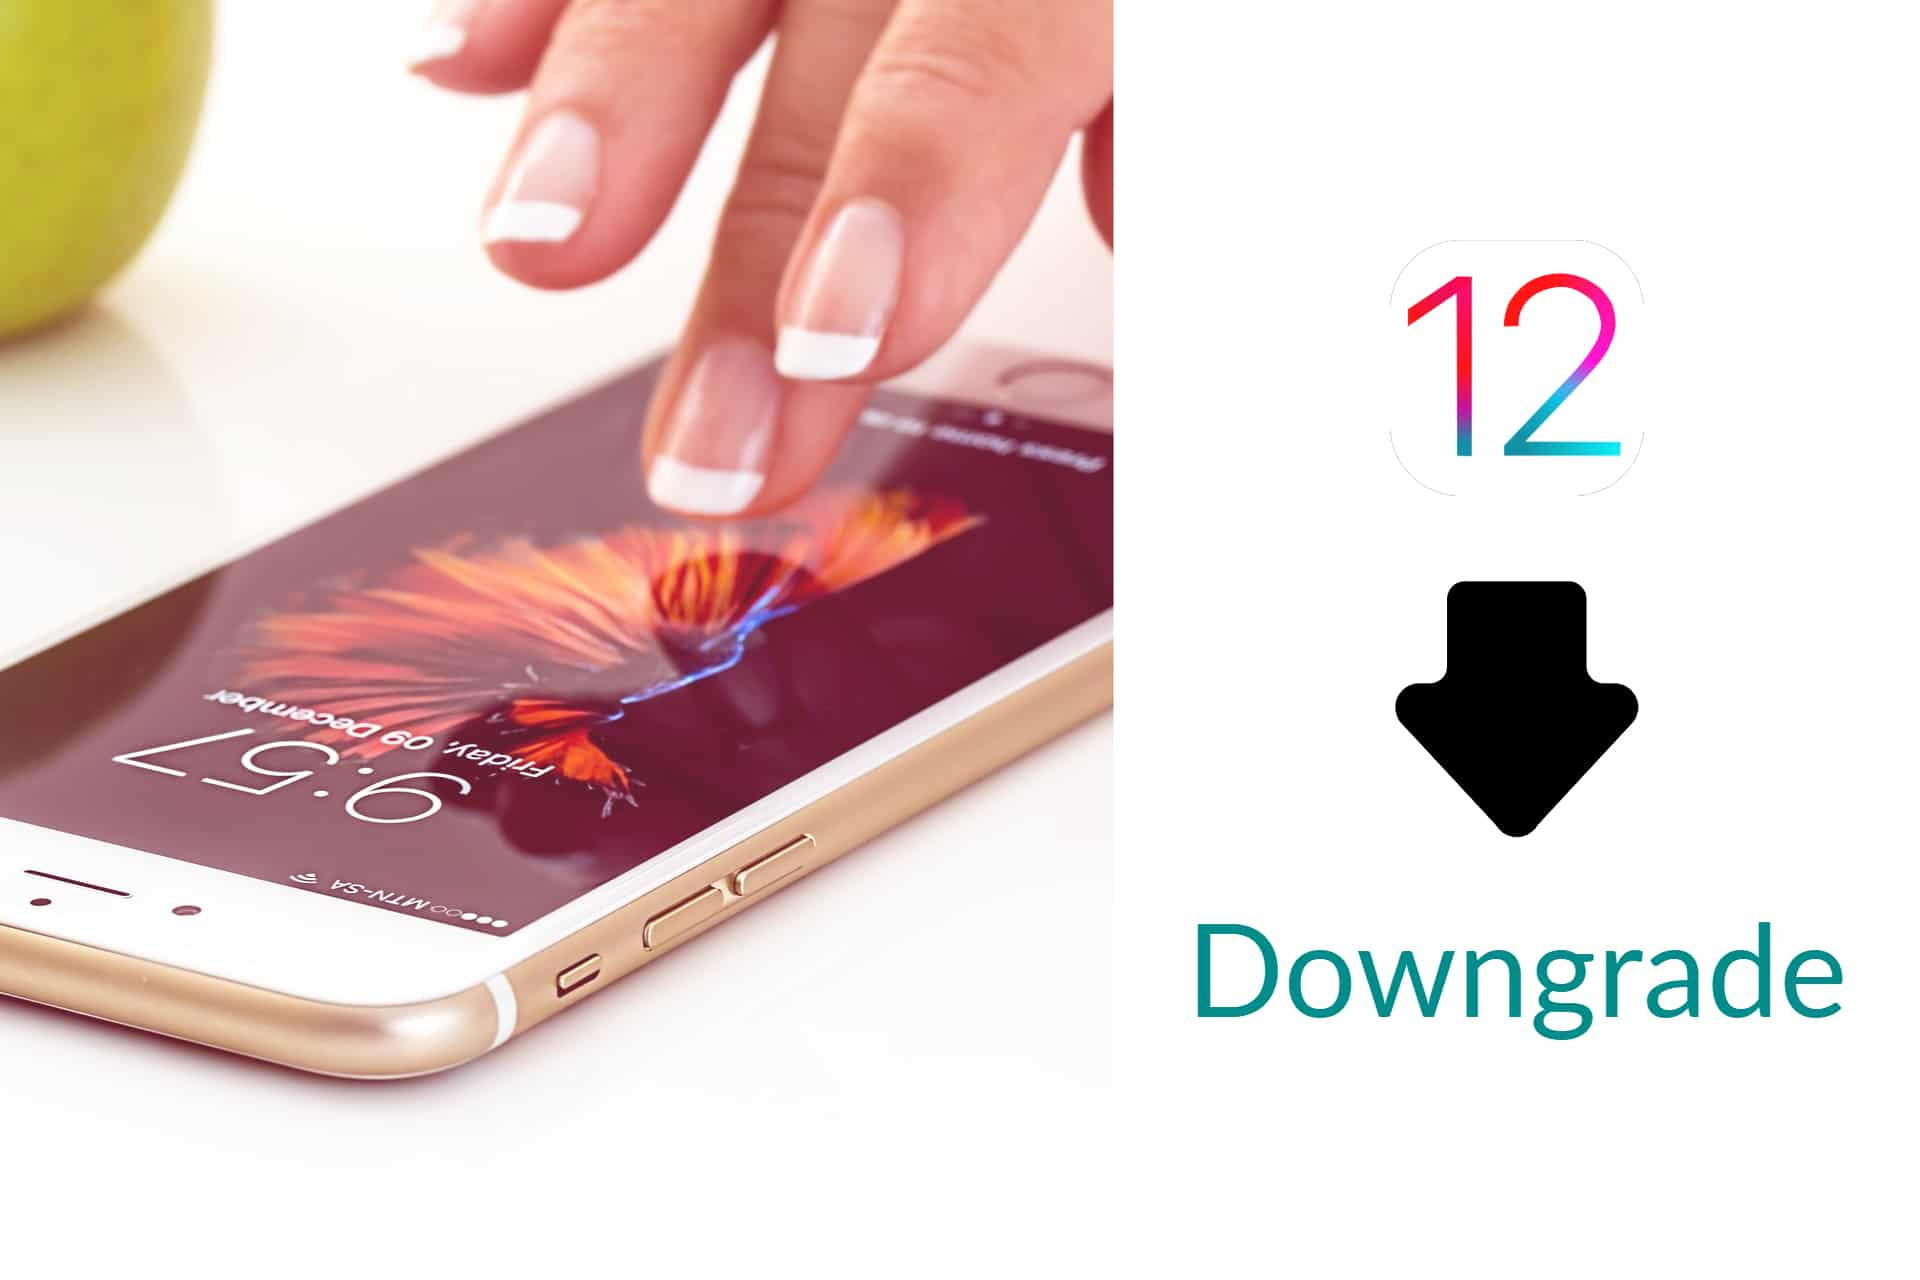 iOS 12 downgrade